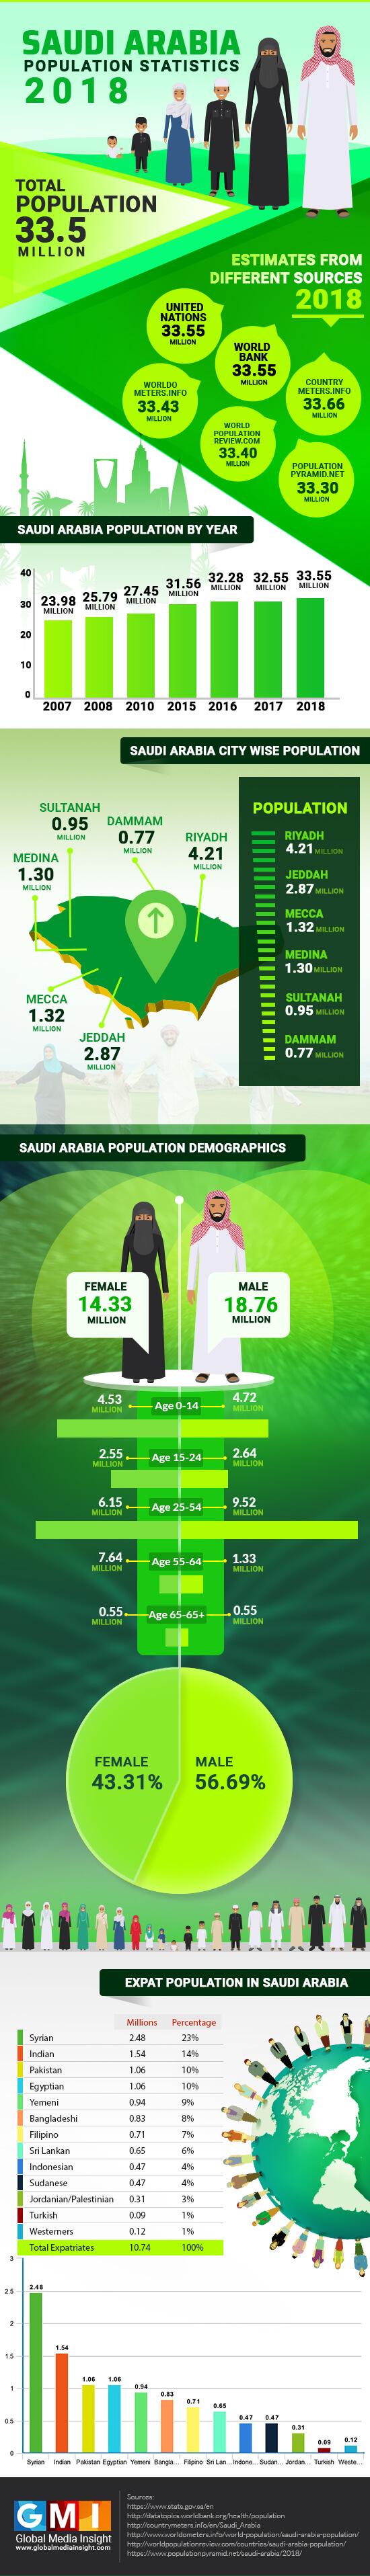 Saudi Arabia Population Statistics - 2018 Infographics